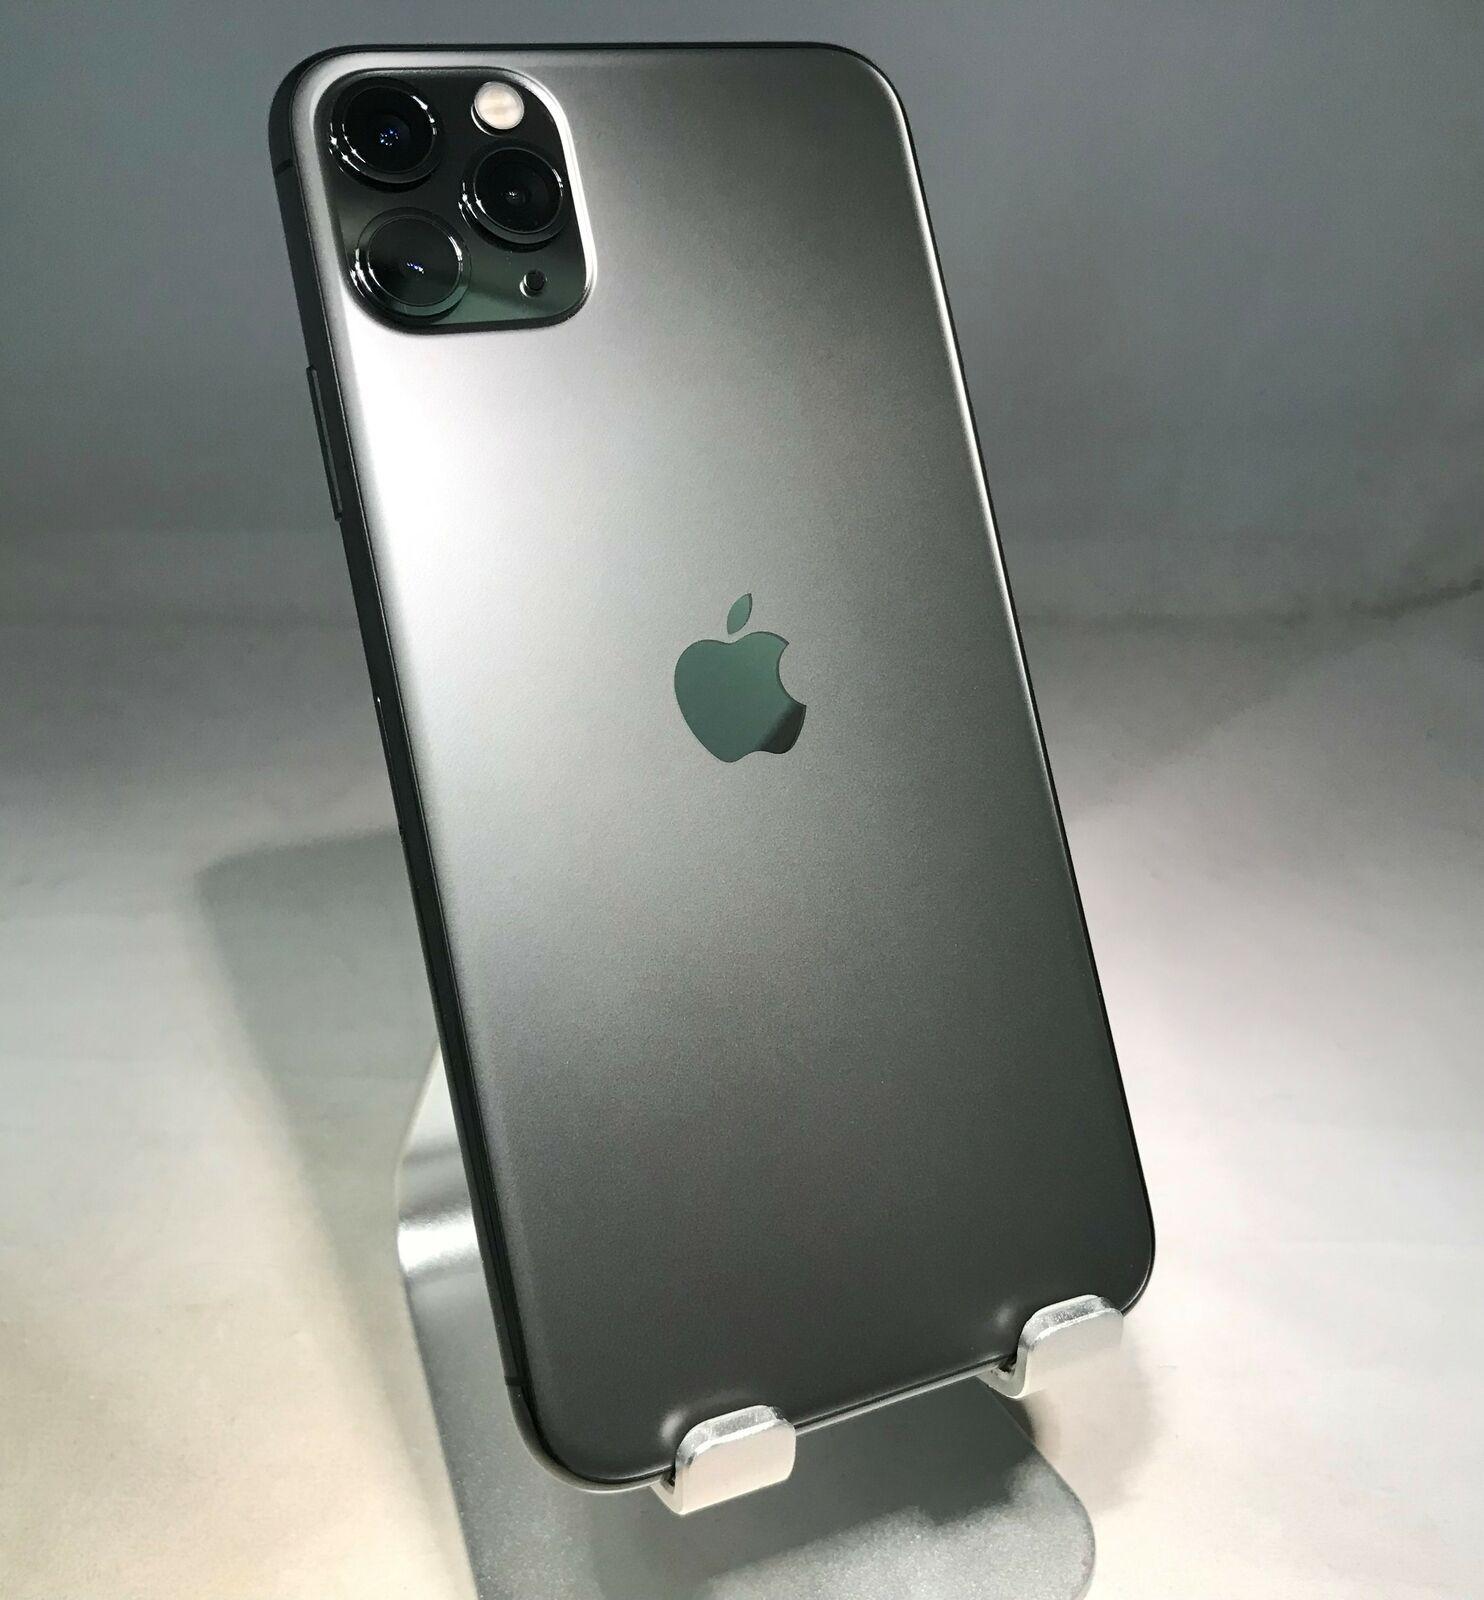 Unlocked Apple Iphone 11 Pro Max Buy 2 Get 1 Free Godolly Iphone Apple Iphone Iphone 11 Pro Max